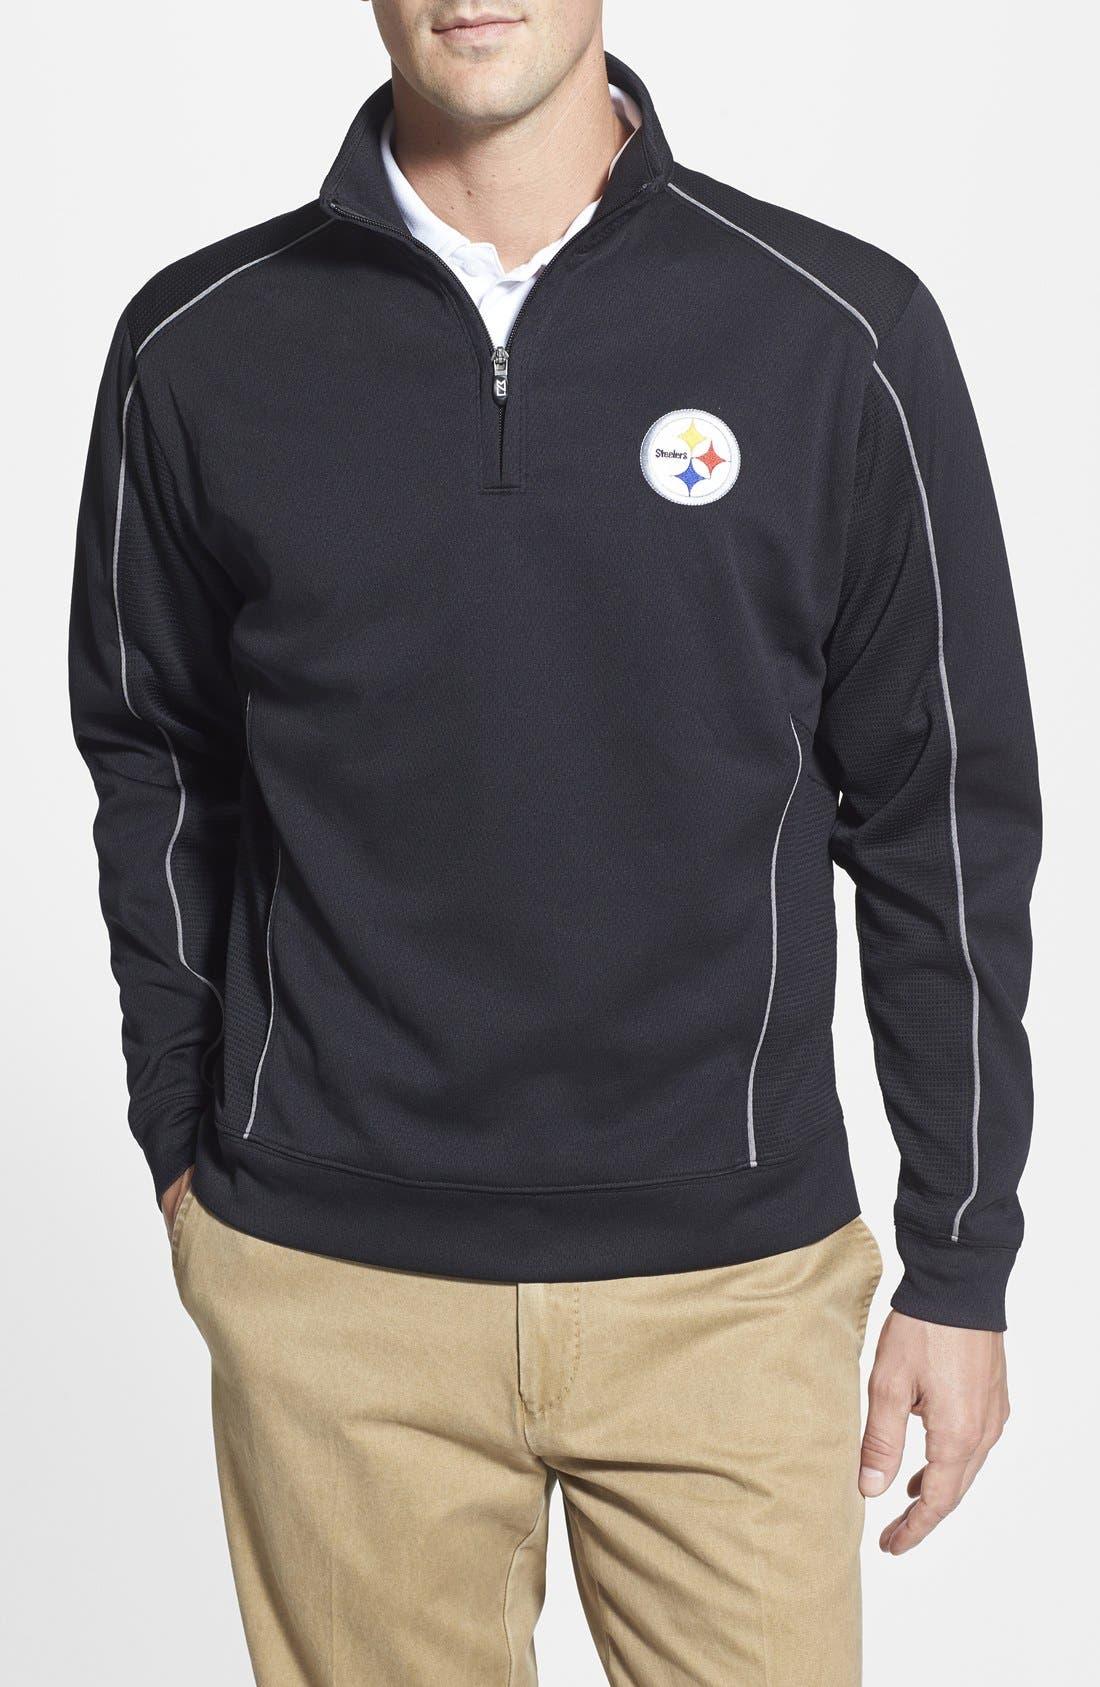 Pittsburgh Steelers - Edge DryTec Moisture Wicking Half Zip Pullover,                             Main thumbnail 1, color,                             001